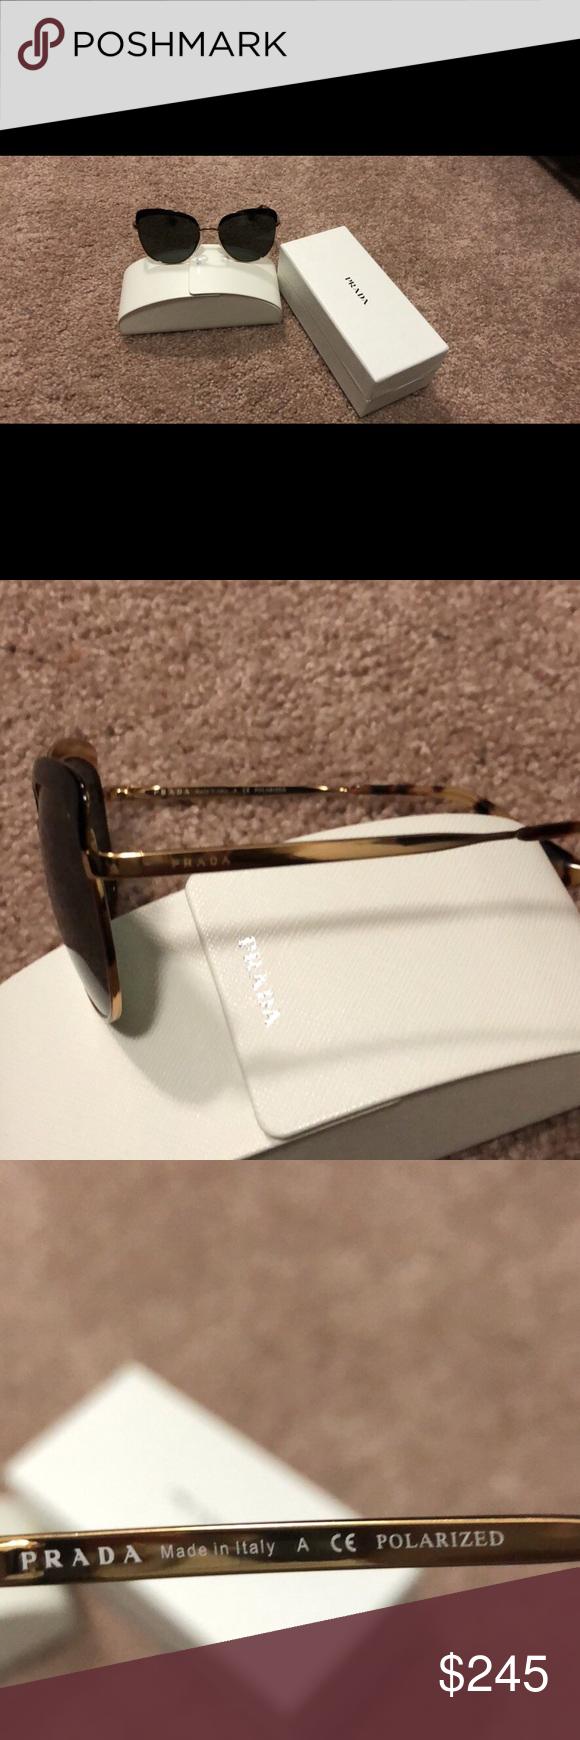 772d2bddd326 ... cheapest prada cat eye sunglasses polarized beautiful in like new  condition prada accessories sunglasses 916ec 88fa4